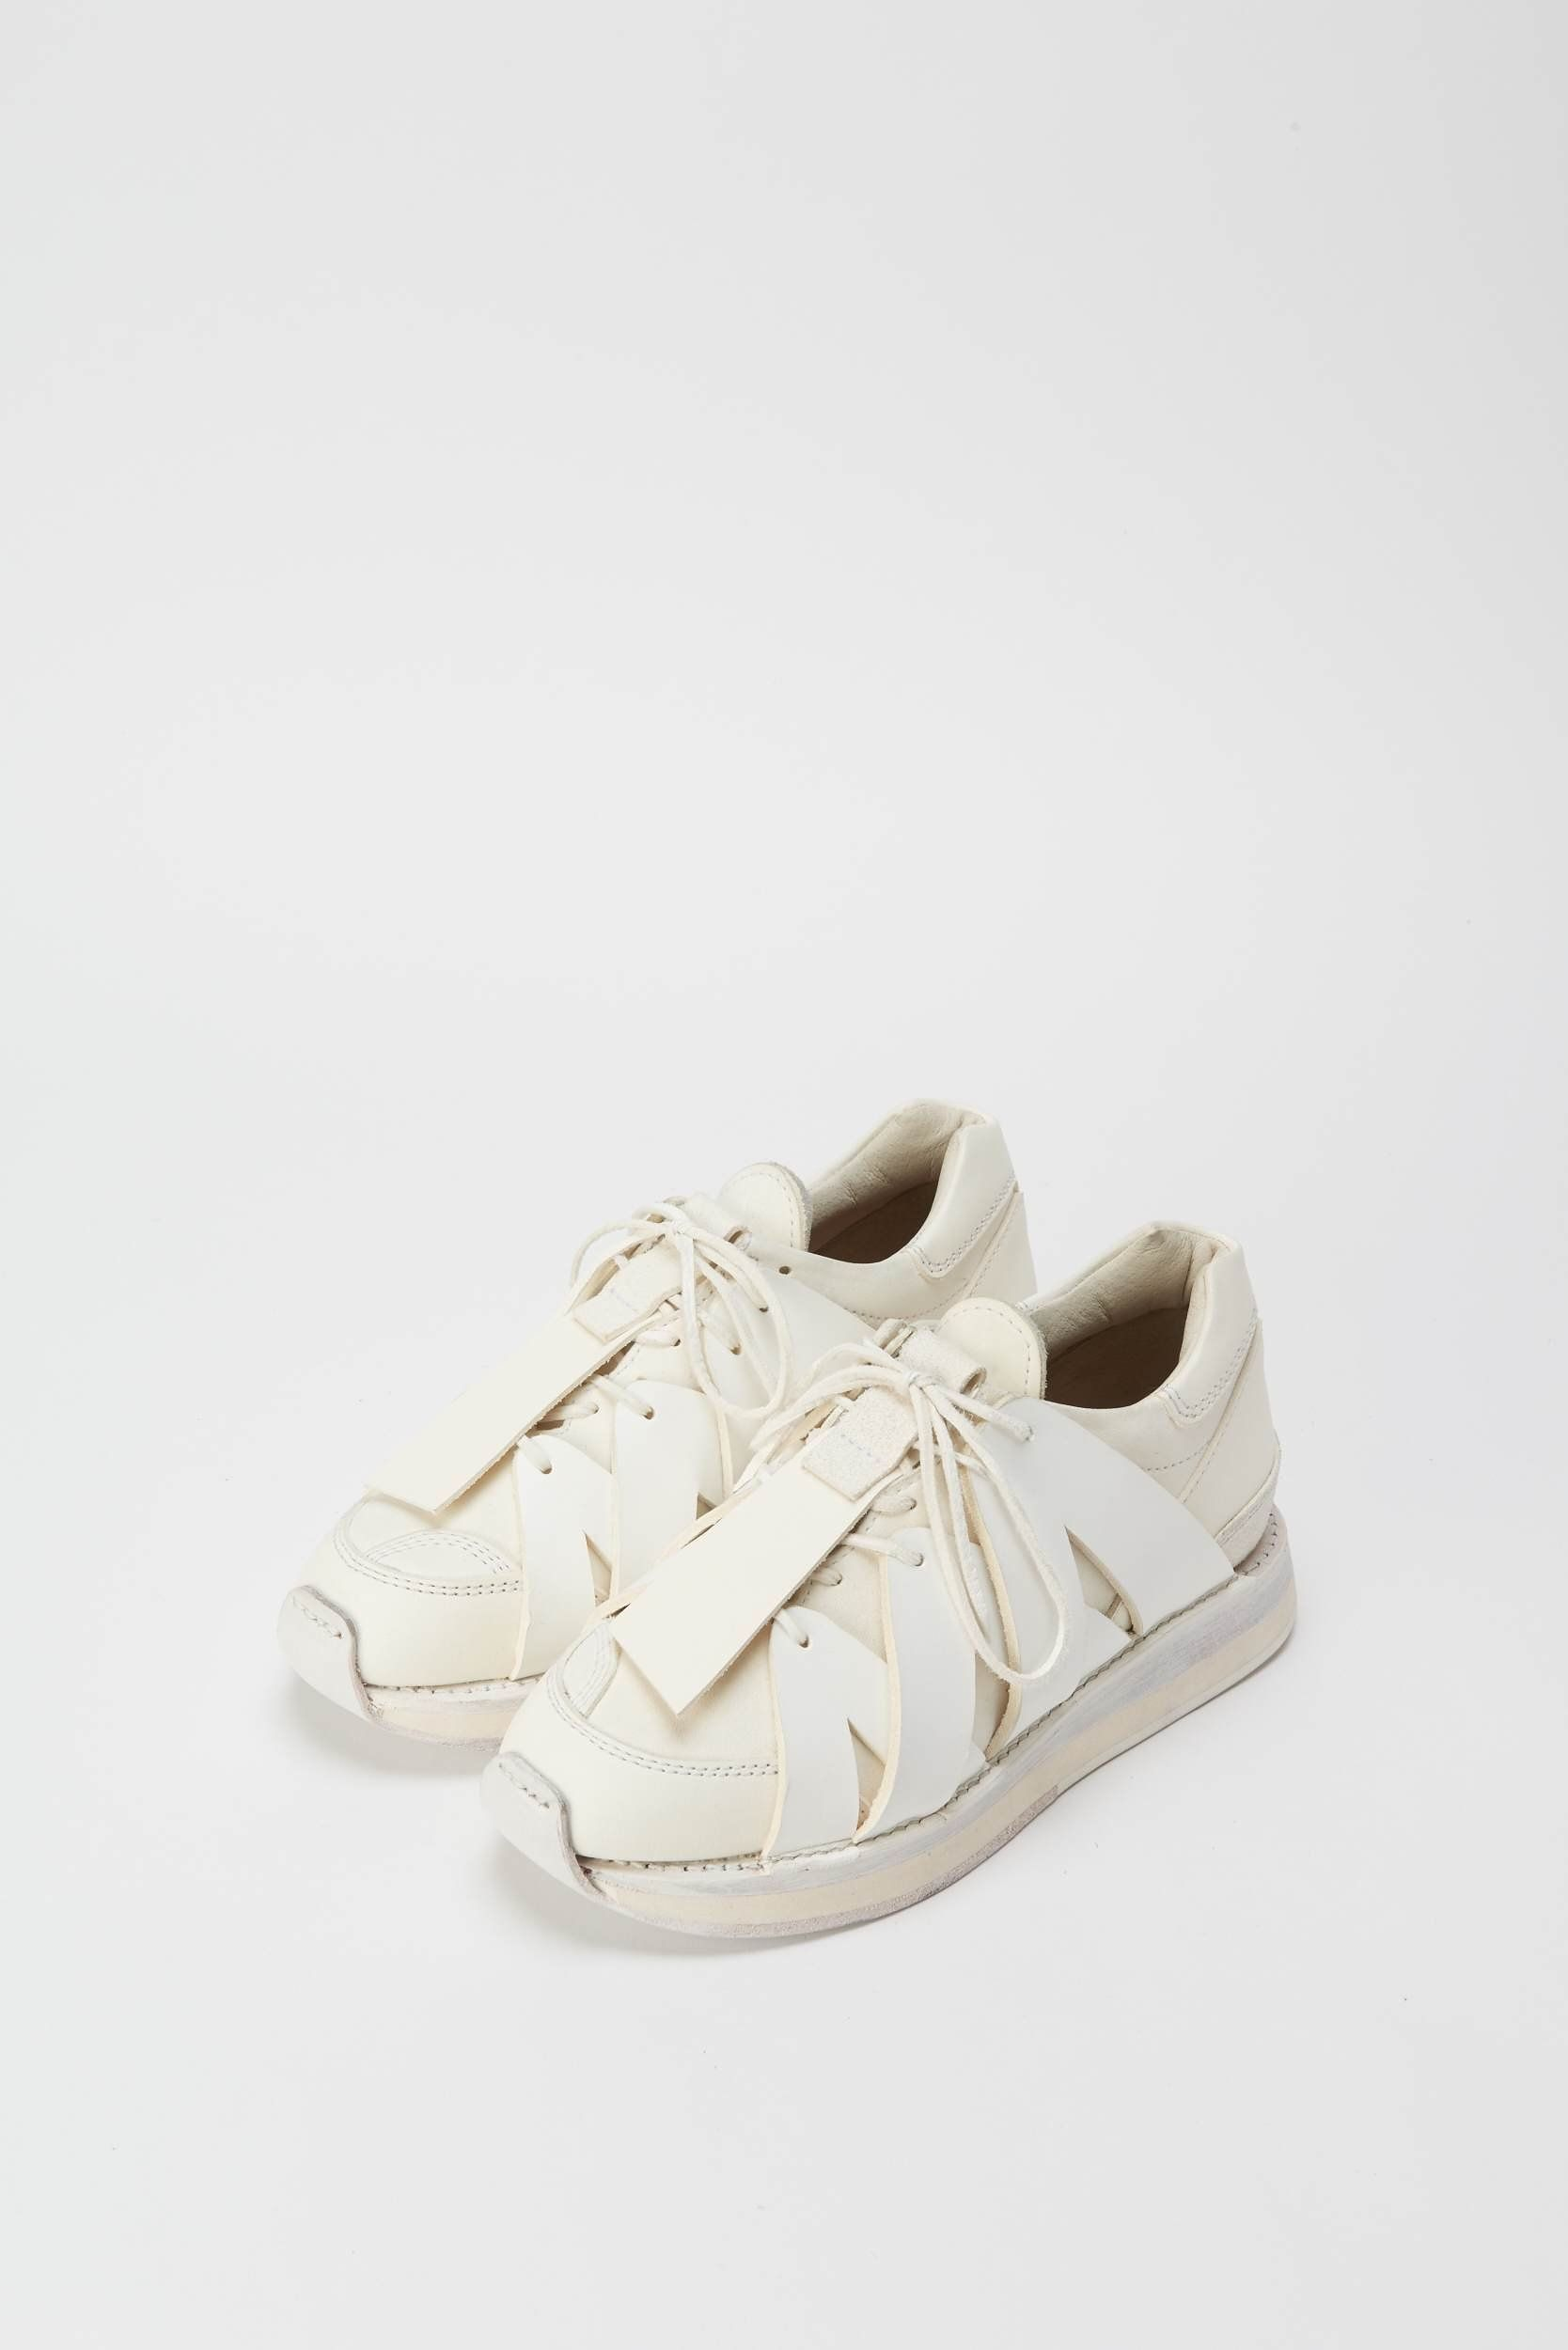 1eb4c8611a28 Sneakerheads